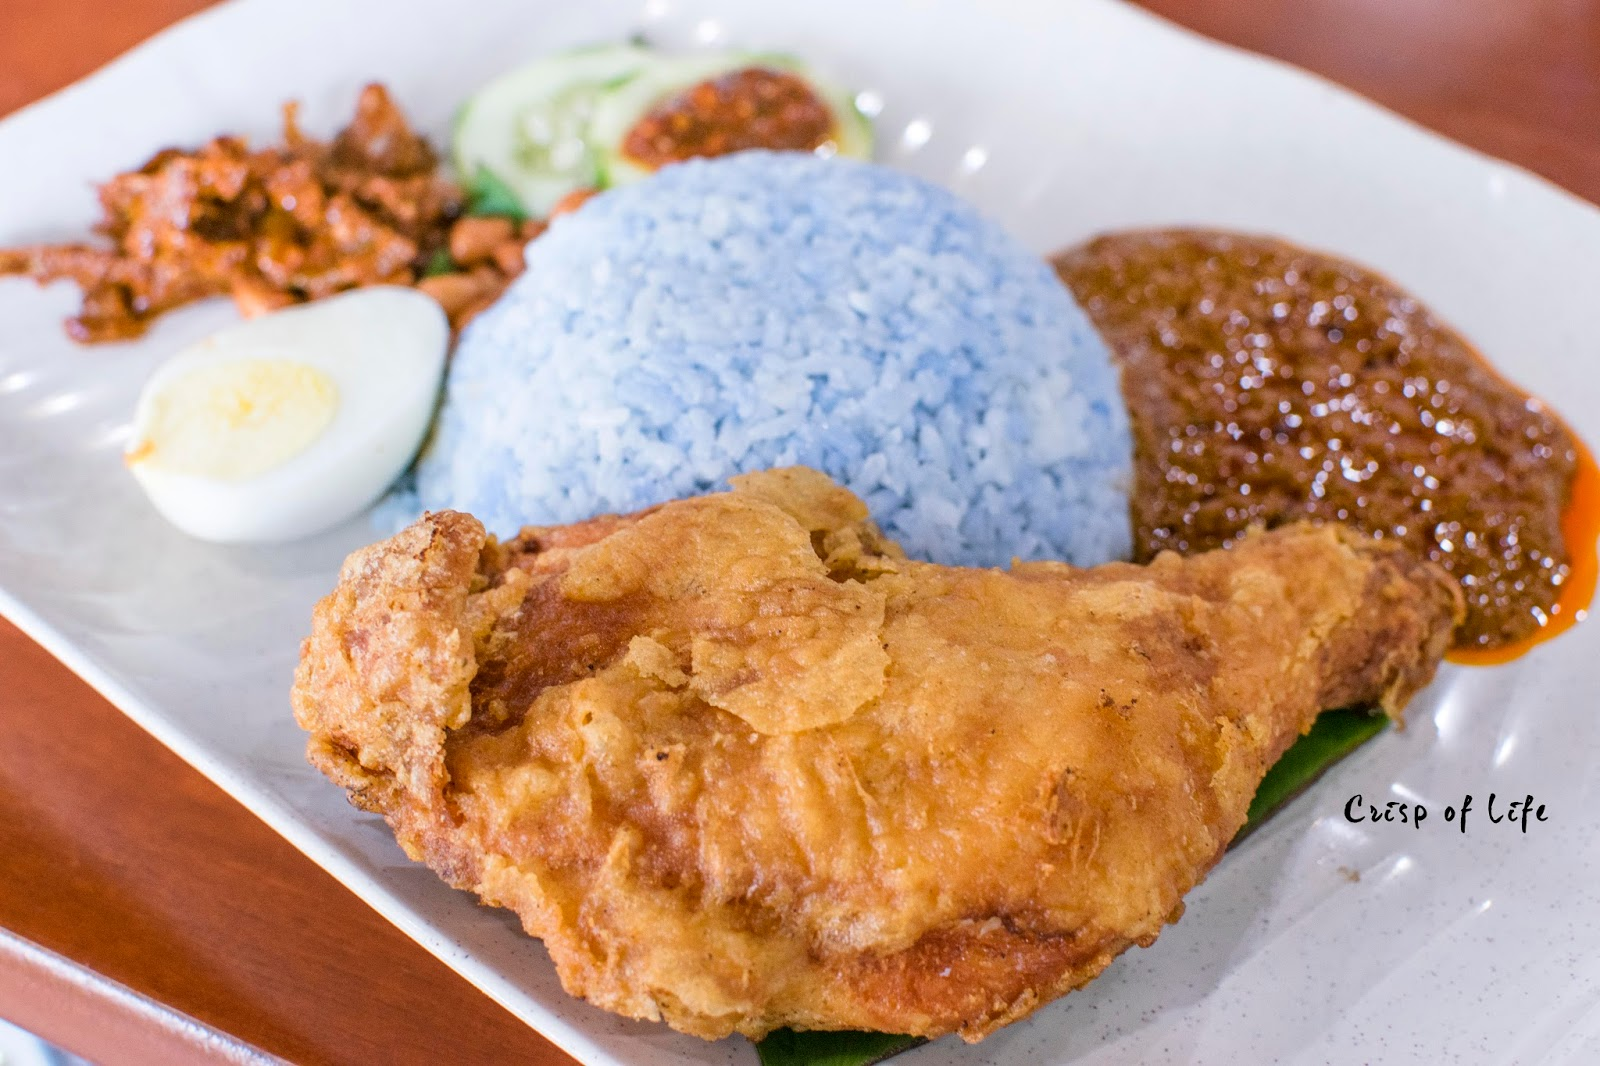 Projek Nasi Lemak Dato Kramat Penang